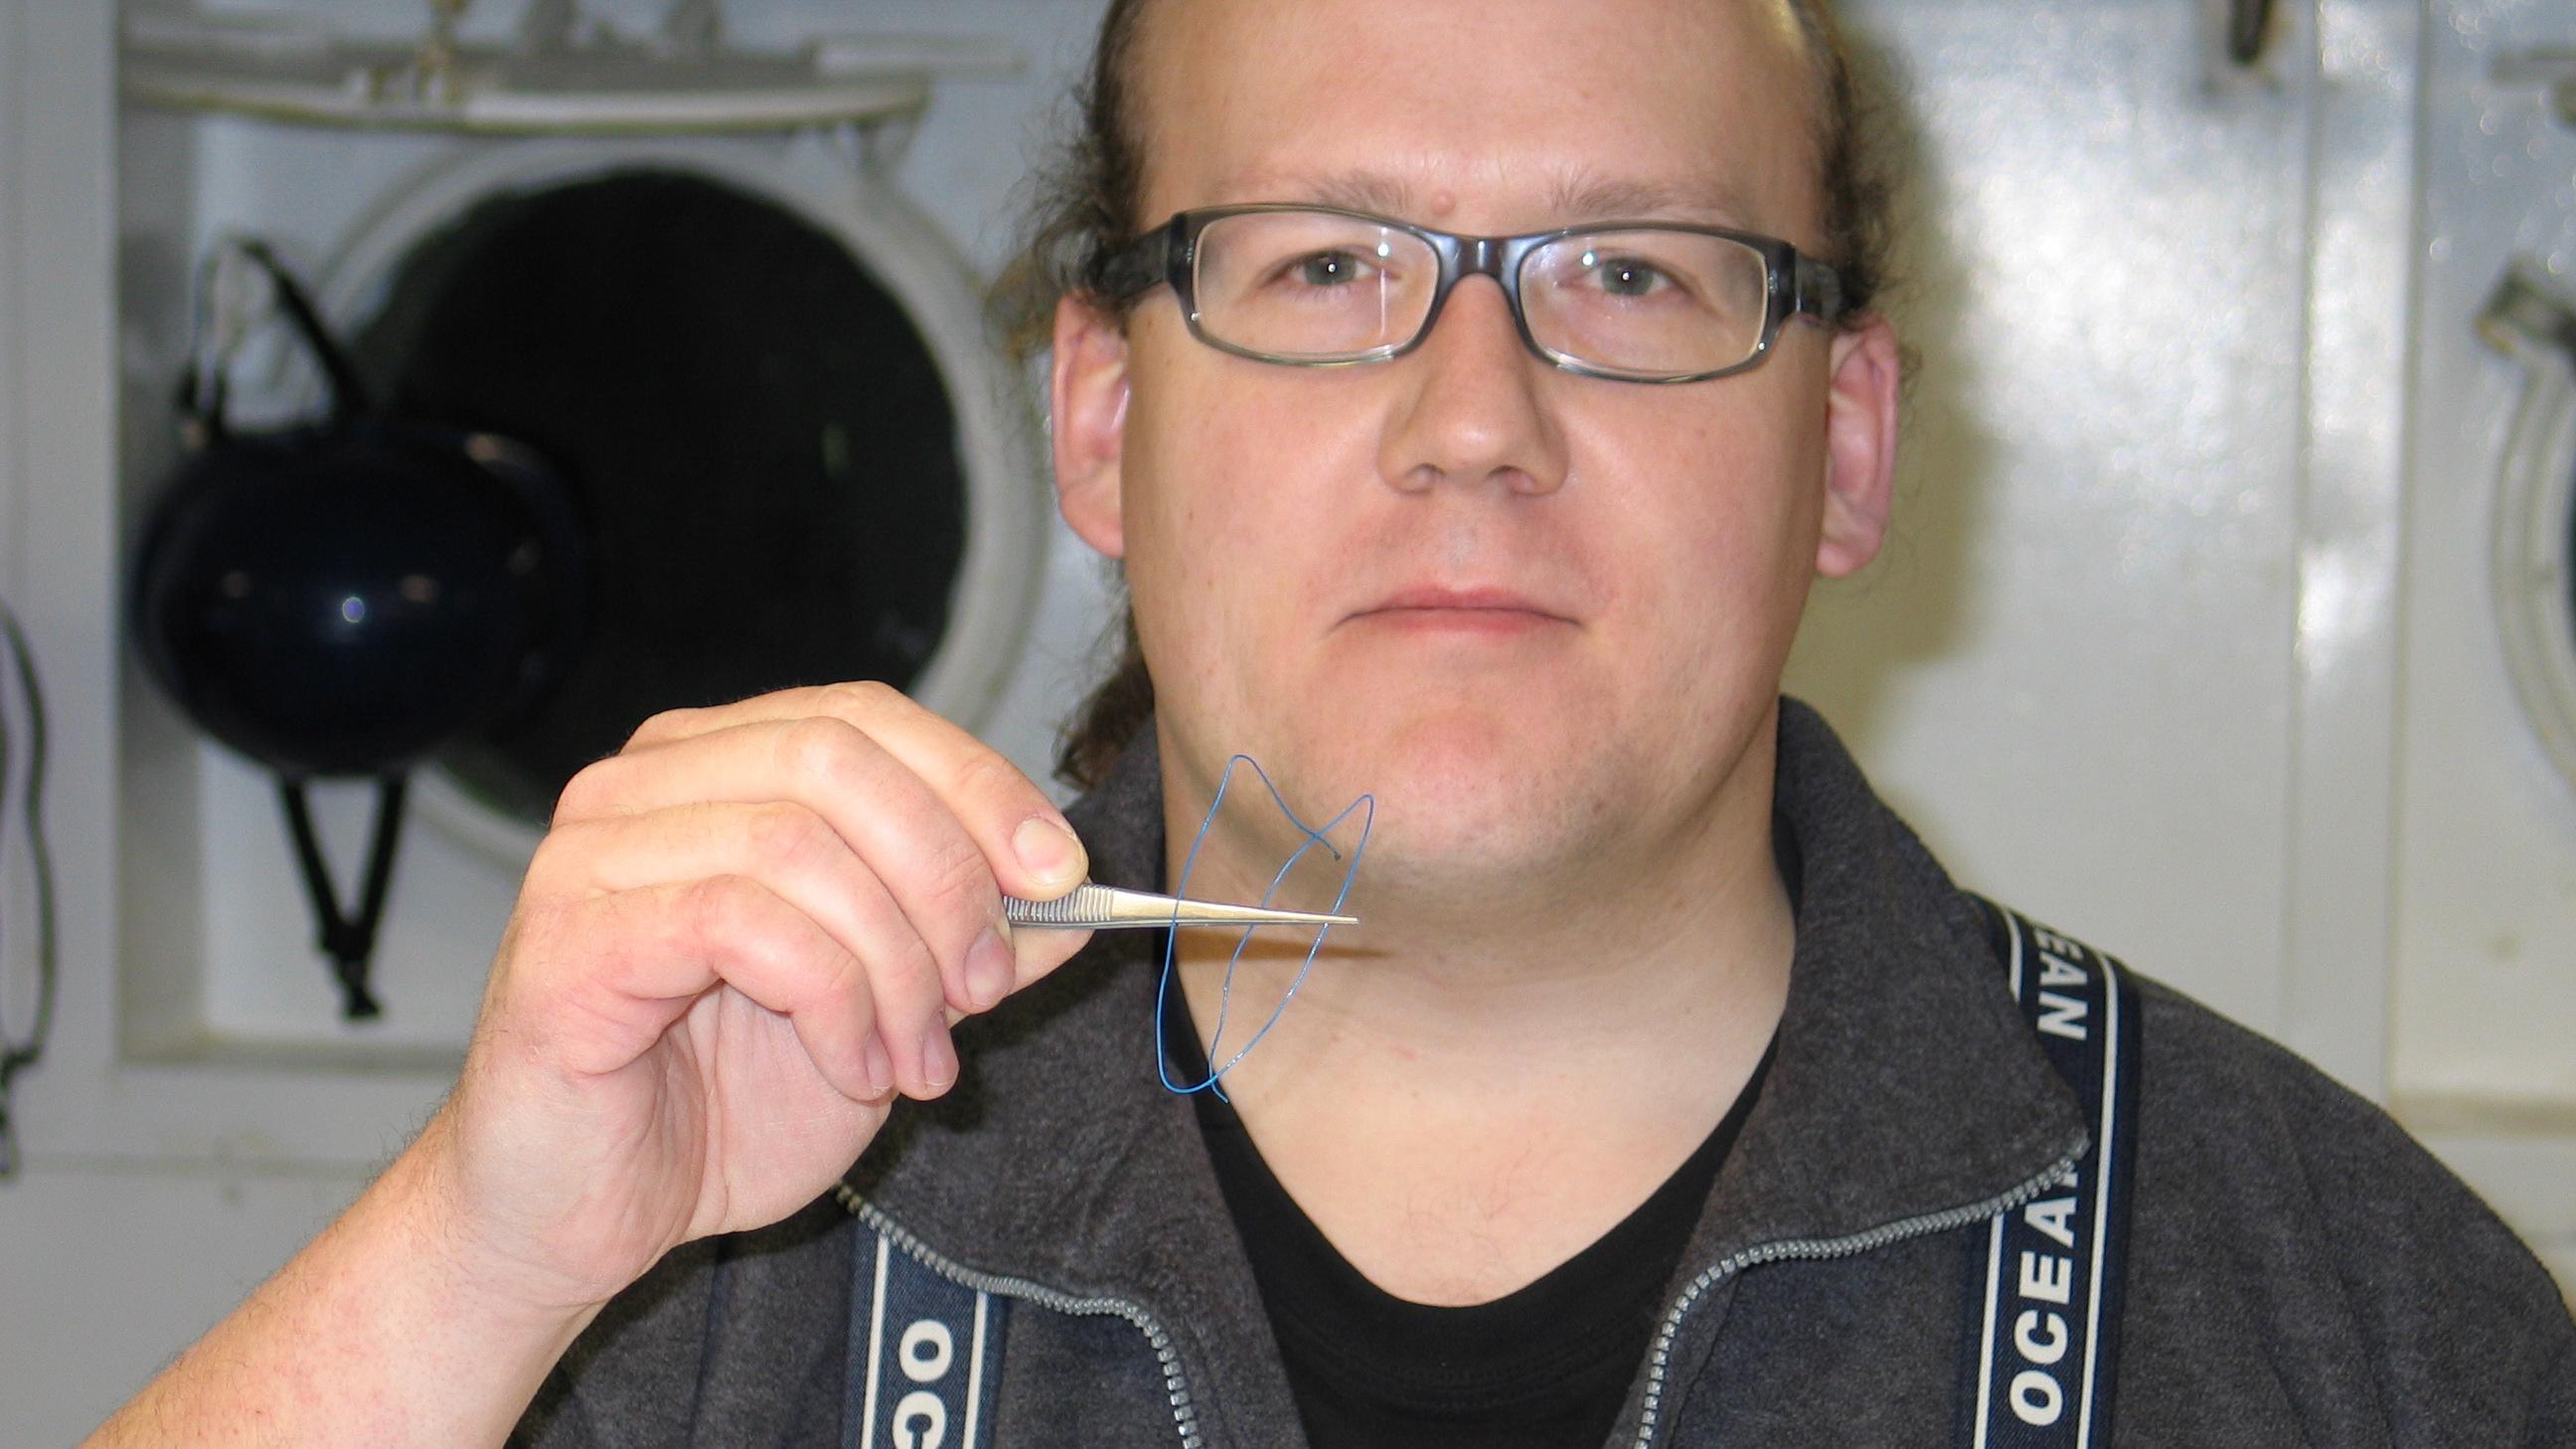 Bastian Huwer